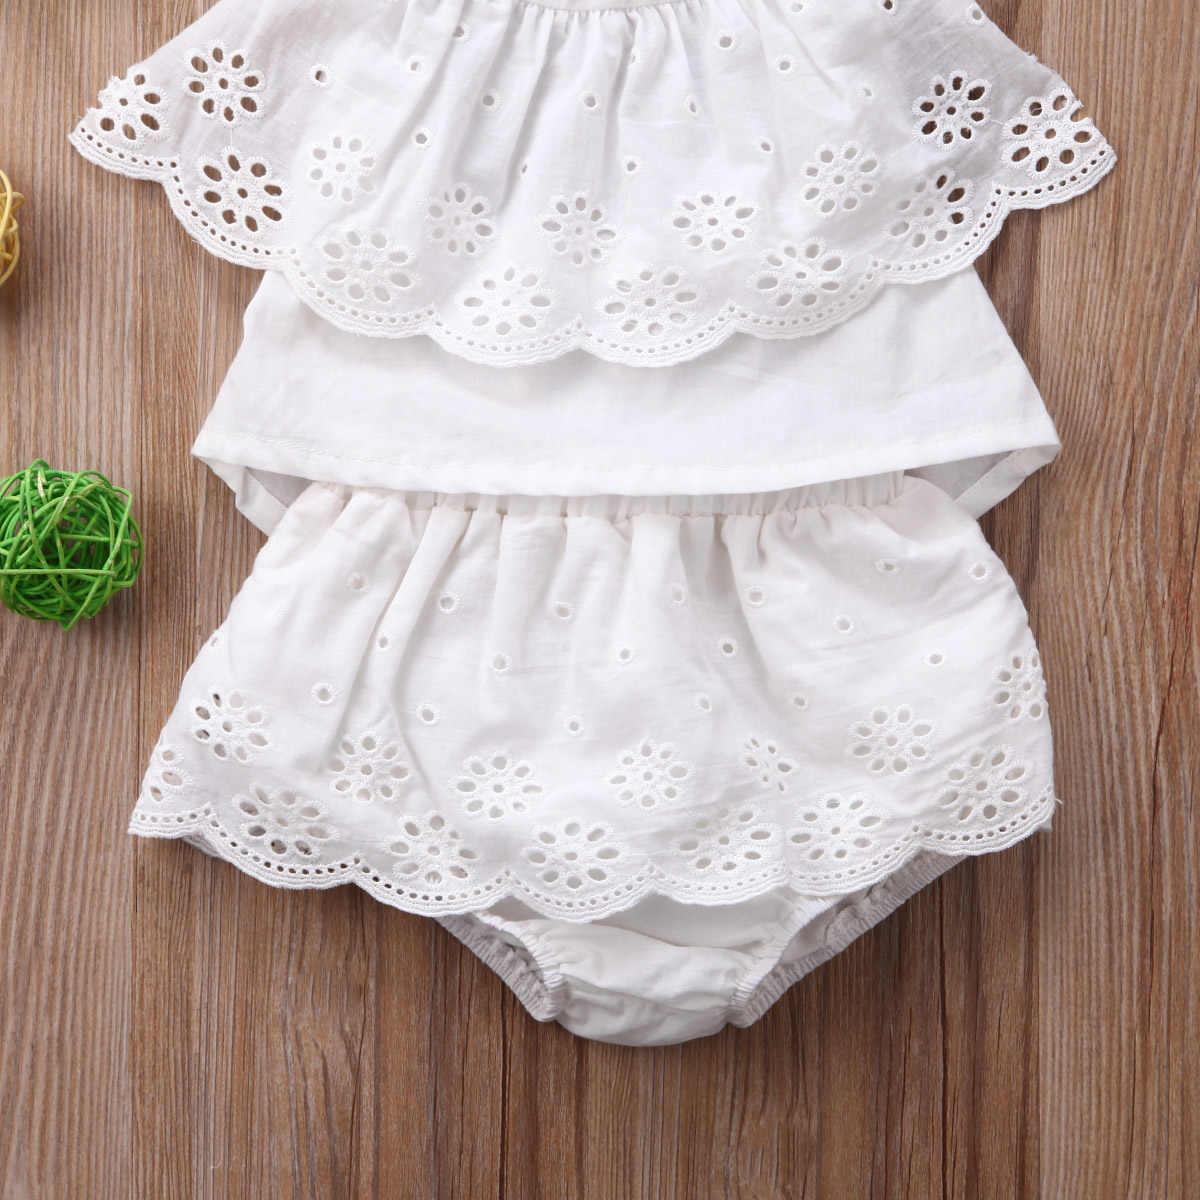 2019 Gadis Pakaian Set 0-24 M Anak-anak Bayi Bayi Gadis Renda Bunga Halter Rok Atasan Celana Pakaian Pakaian